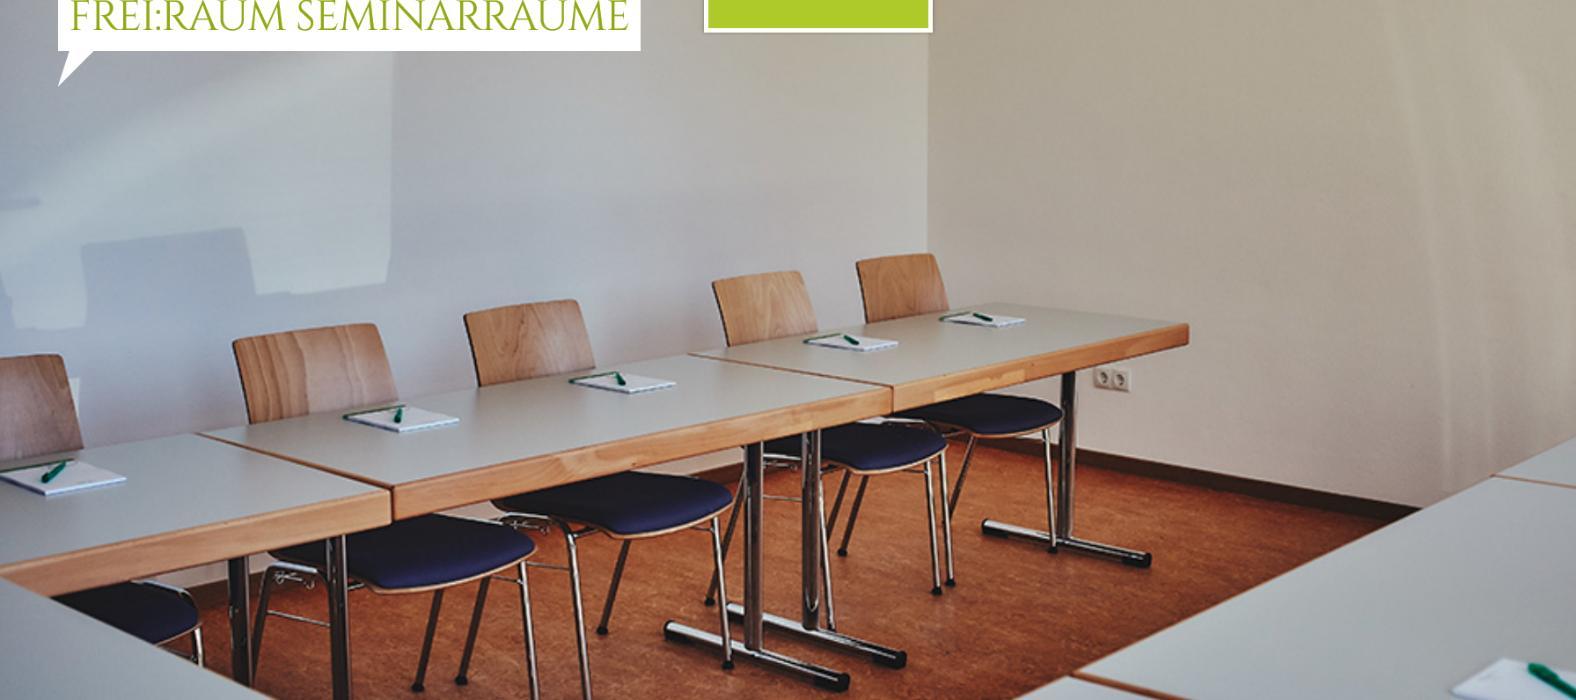 Seminarräume1